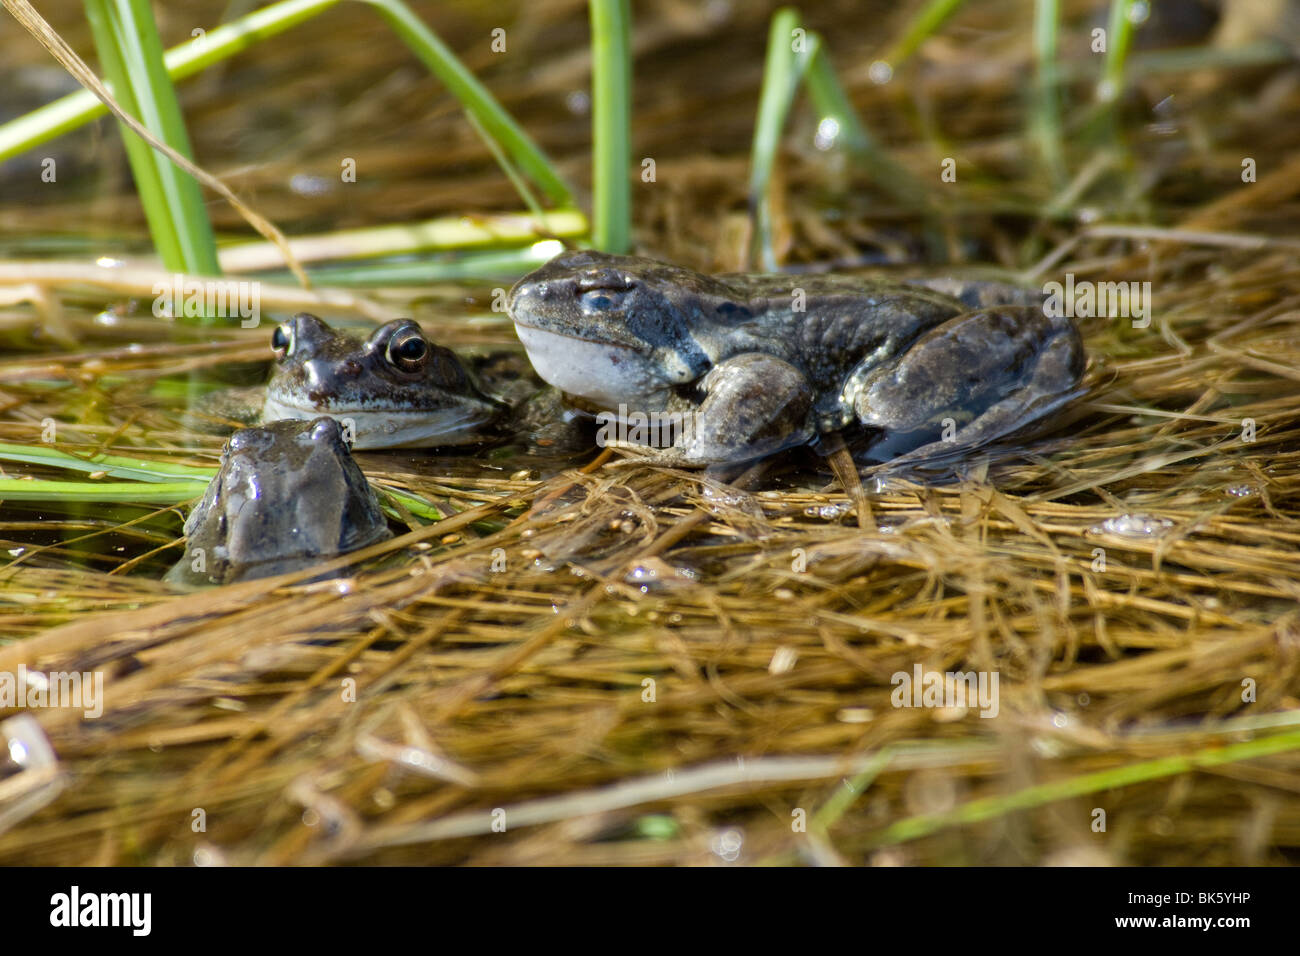 Rana temporaria anfibi anuri sangue freddo cold blood inverno frog cold portrait primo piano Engadina Val Roseg - Stock Image